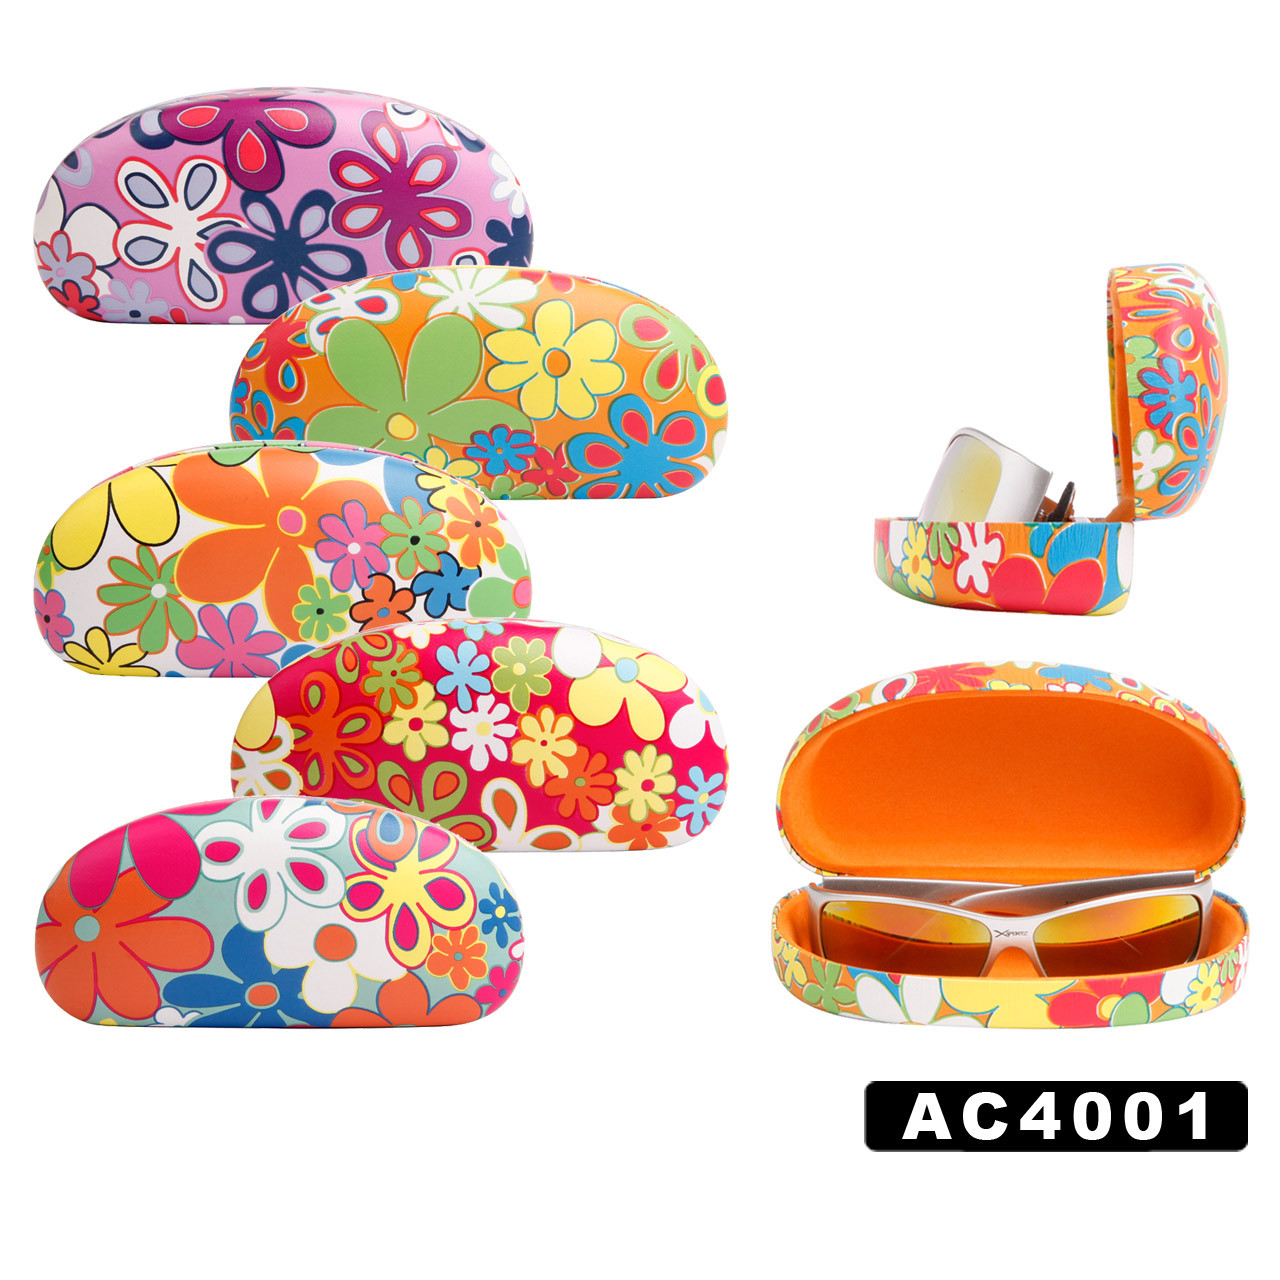 Floral Print Wholesale Sunglass Hard Cases AC4001